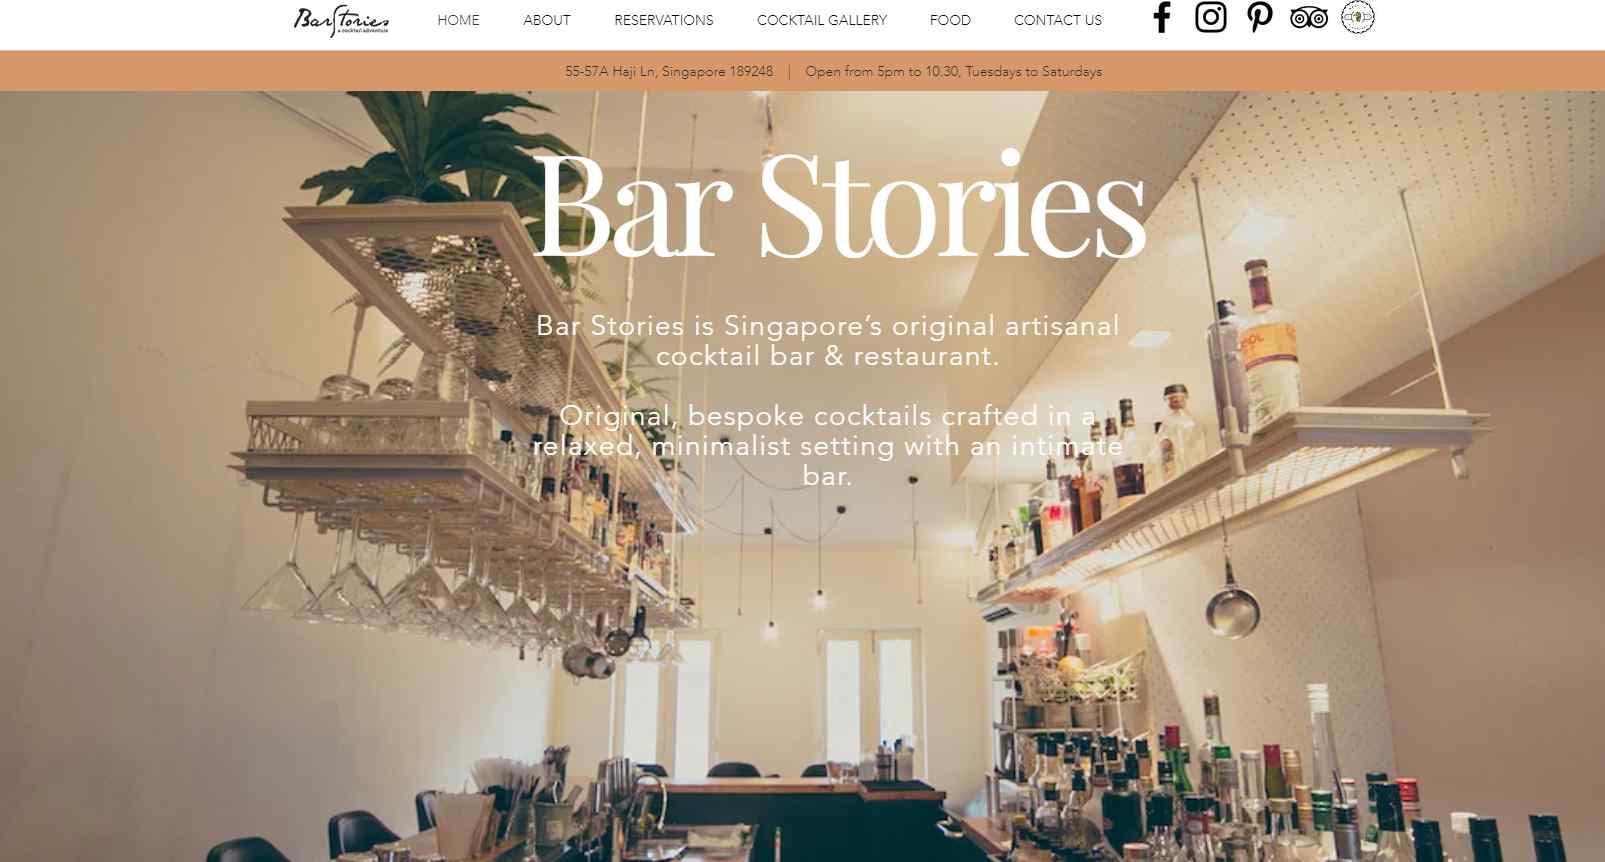 bar stories Top Bars in Singapore